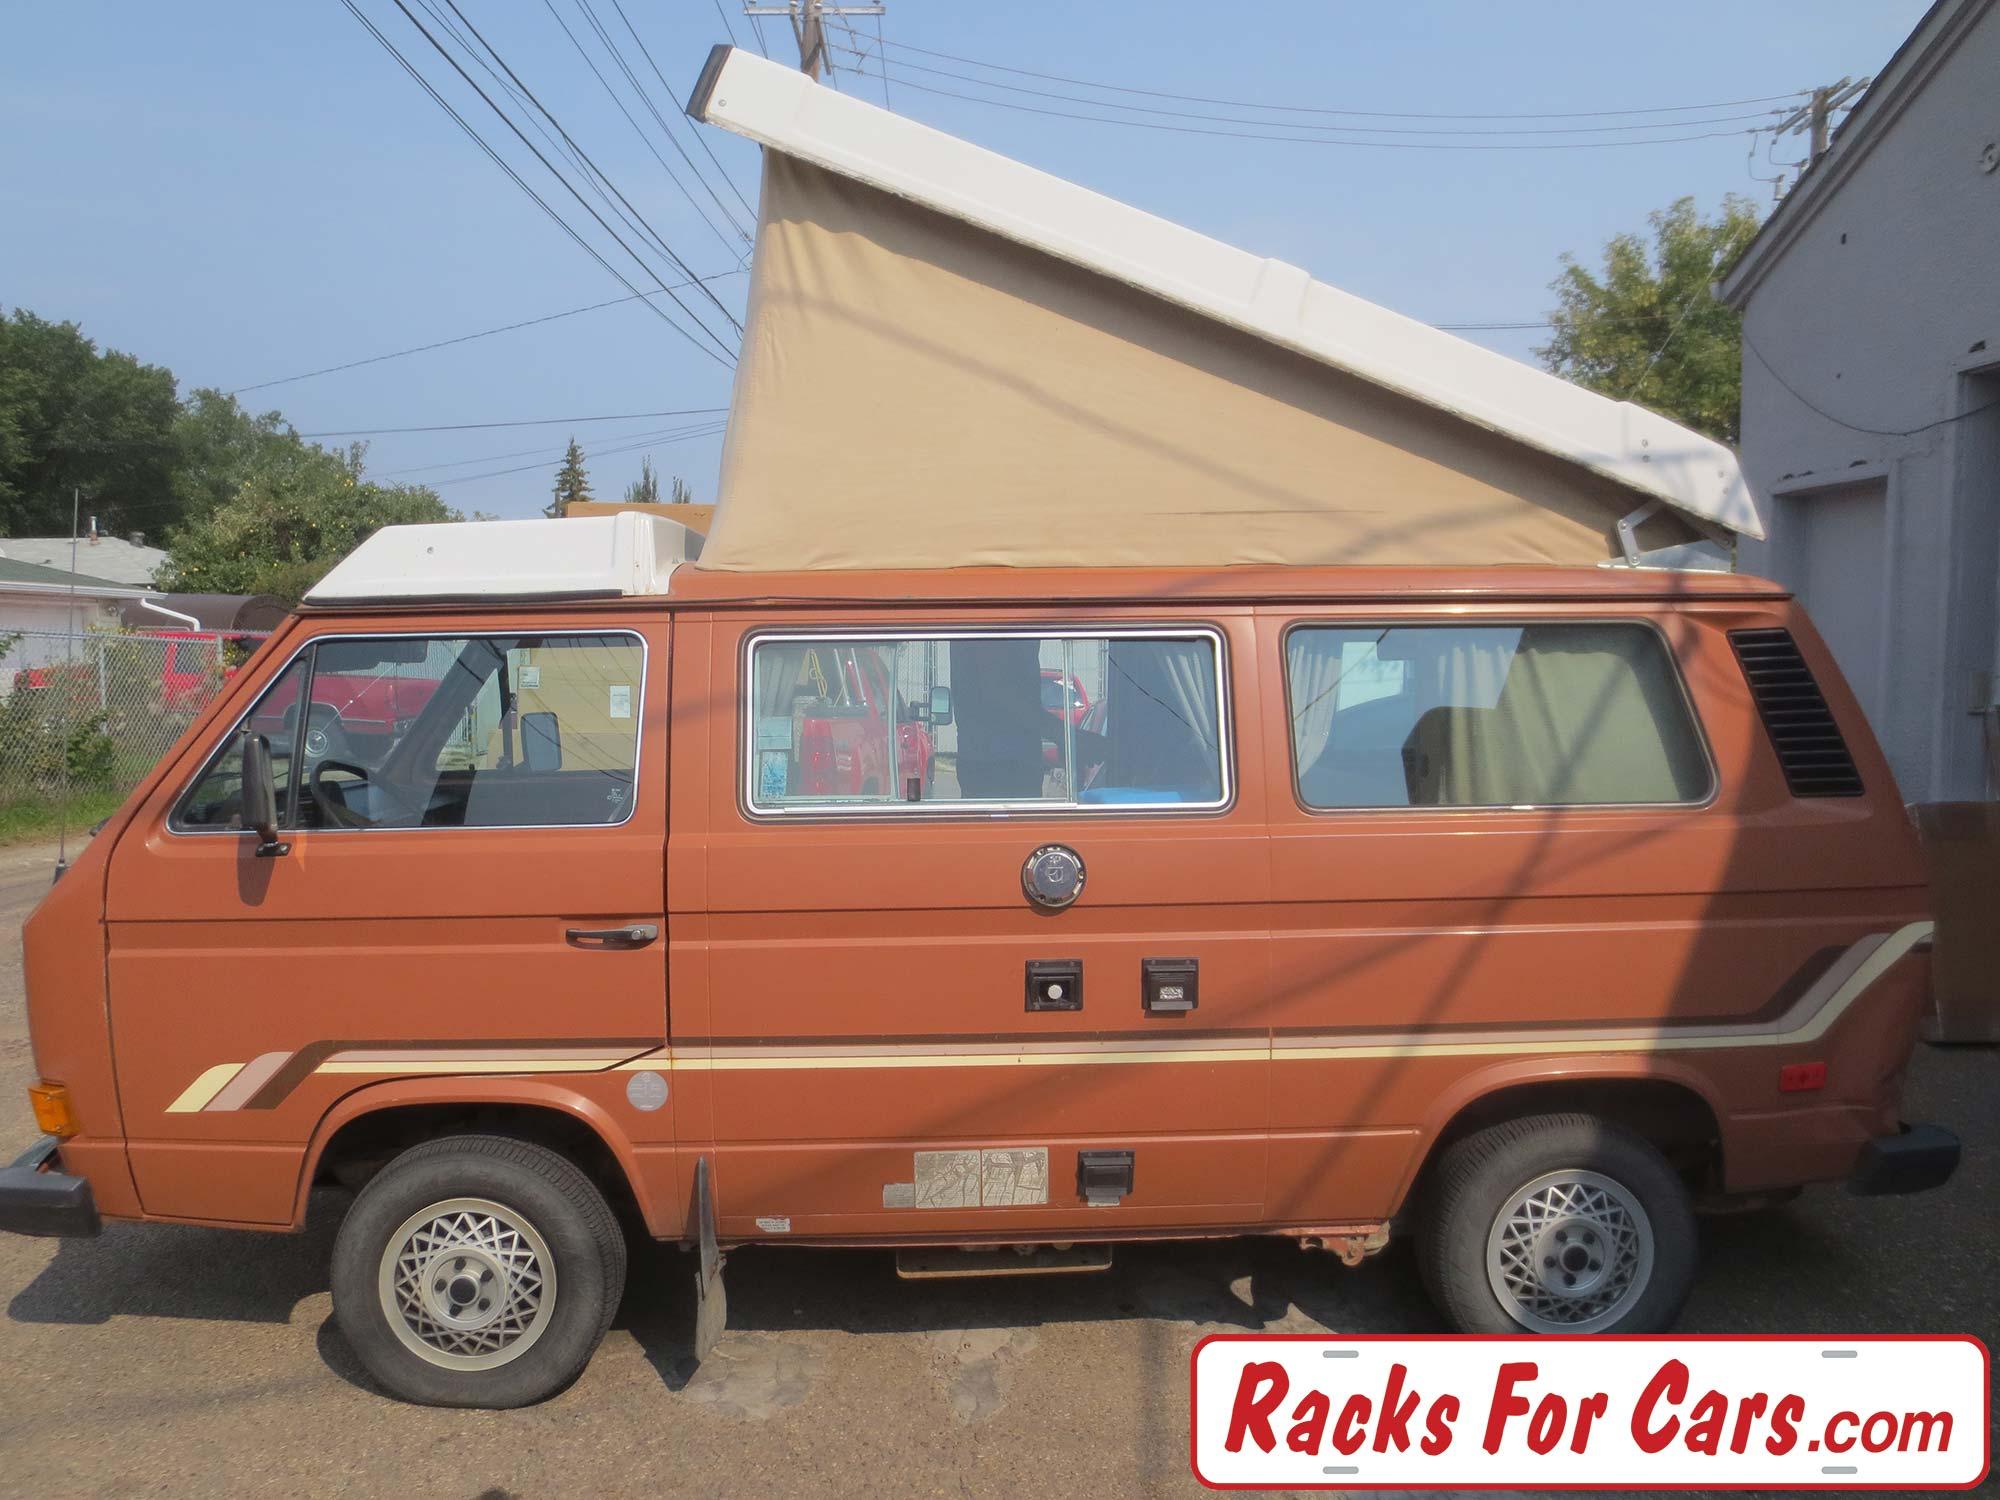 VW Vanagon Westfalia with Thule 300 roof rack - Racks For Cars